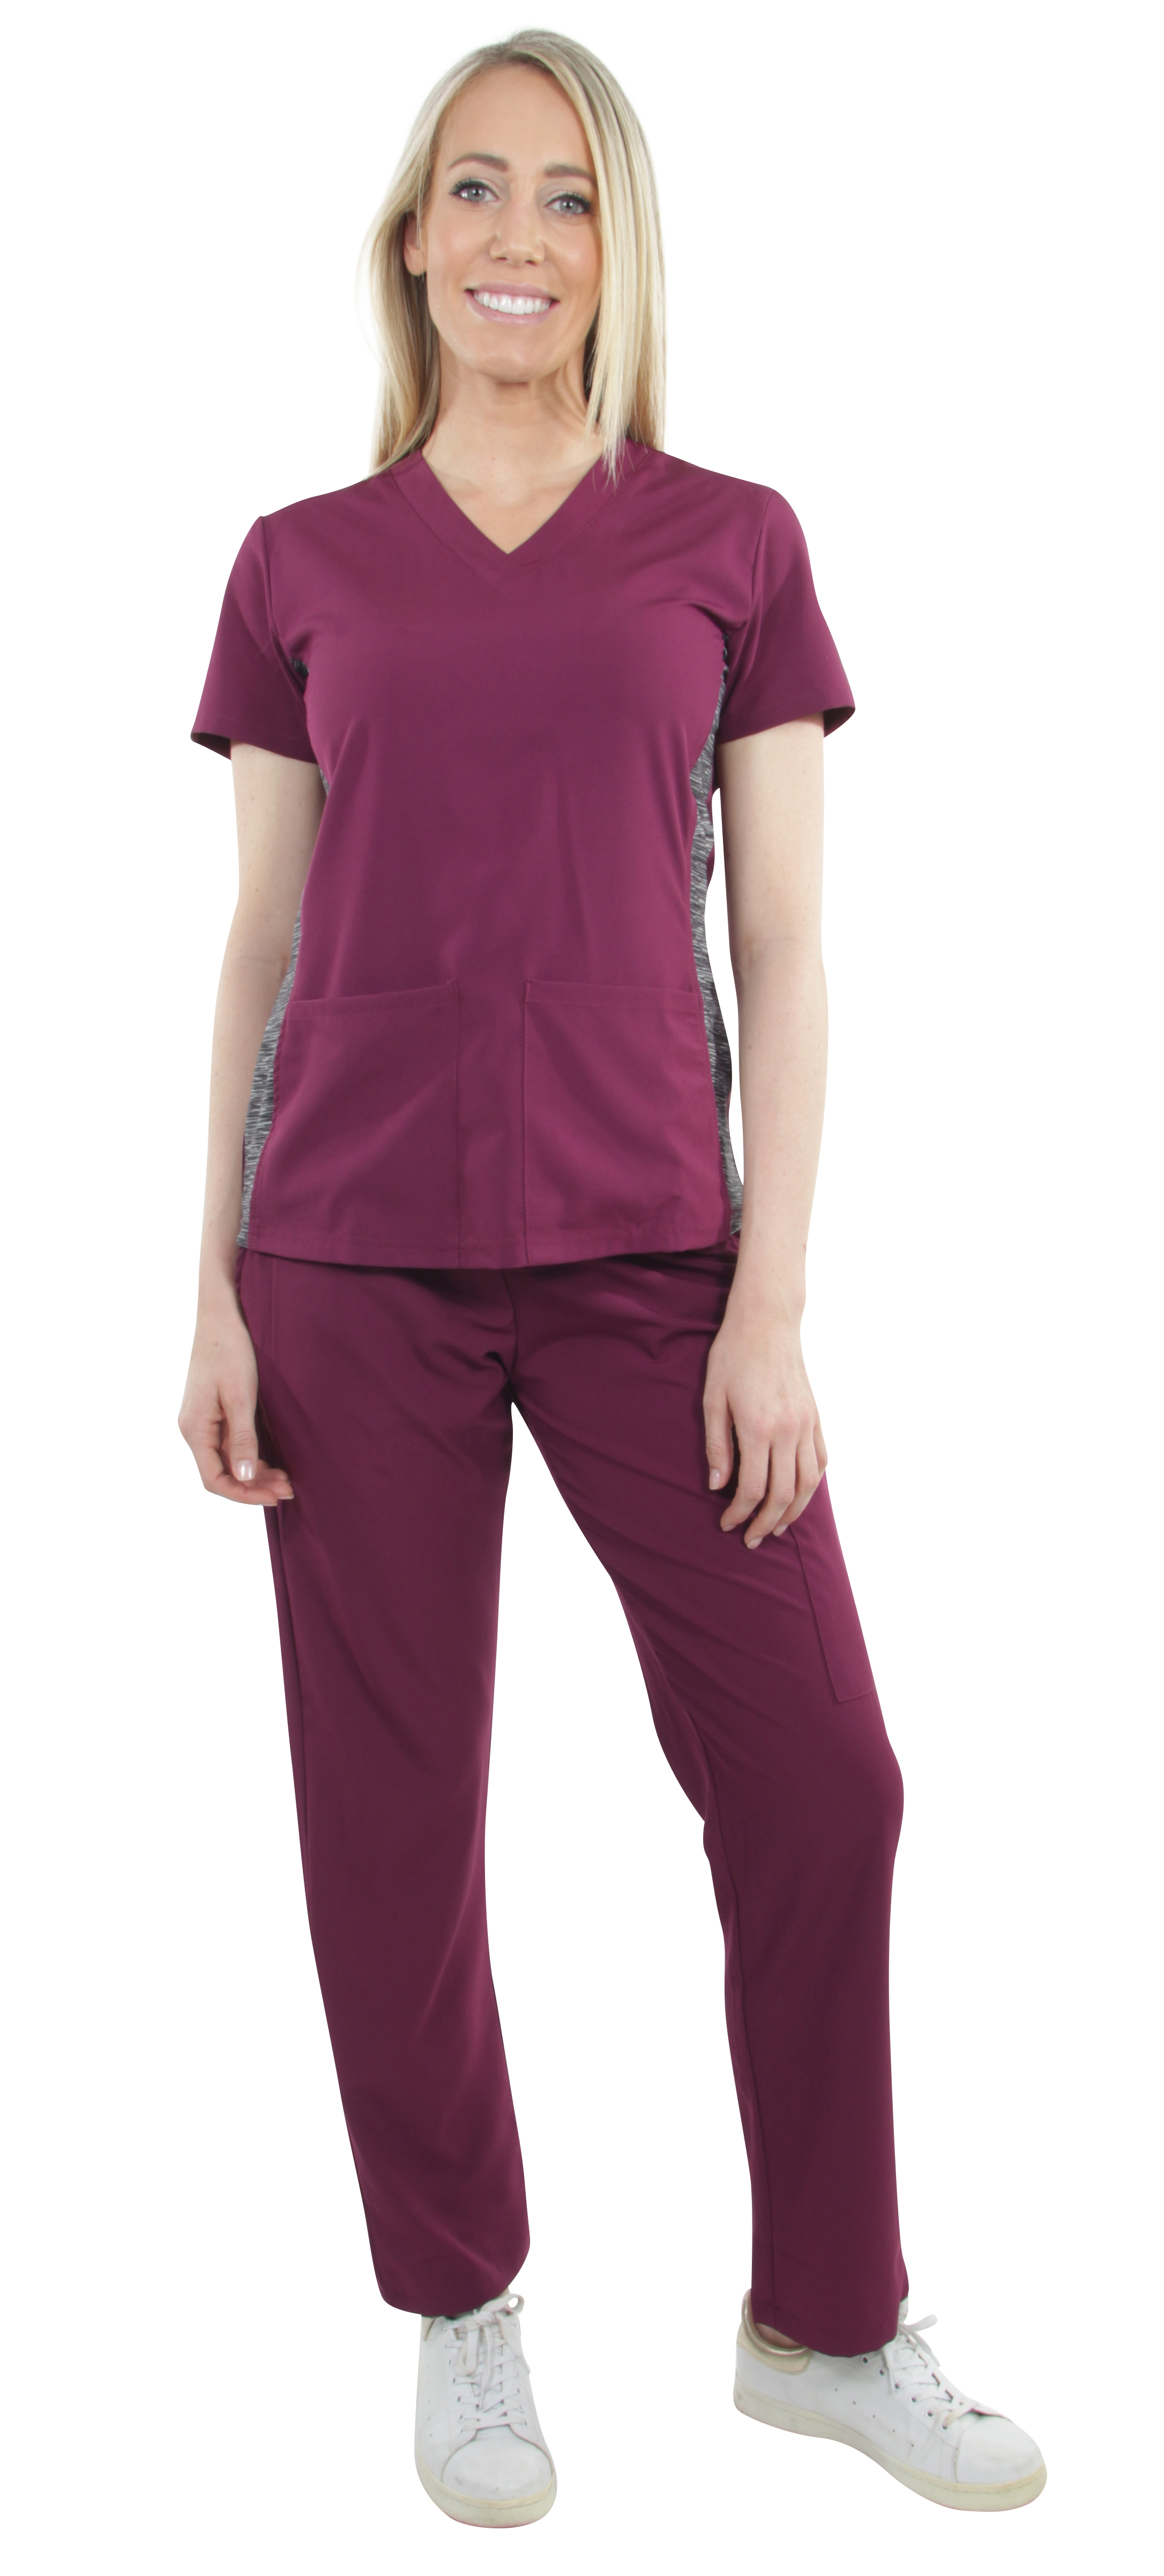 Unisex-Performance-Stretch-Medical-Uniform-Five-Pockets-V-Neck-Scrubs-Sets miniature 8